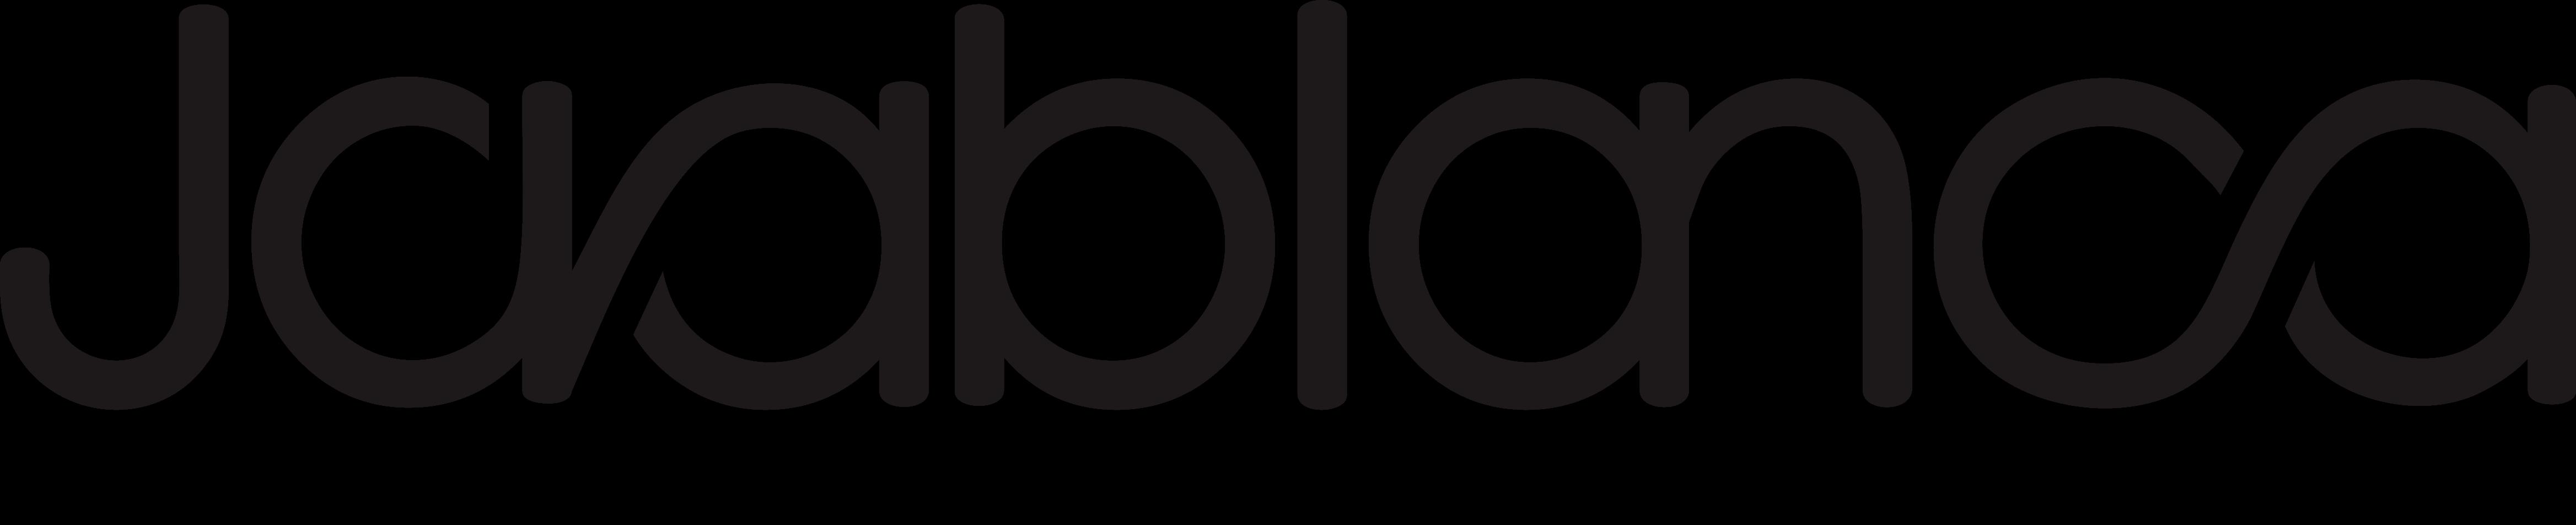 Logo Javablanca (black)